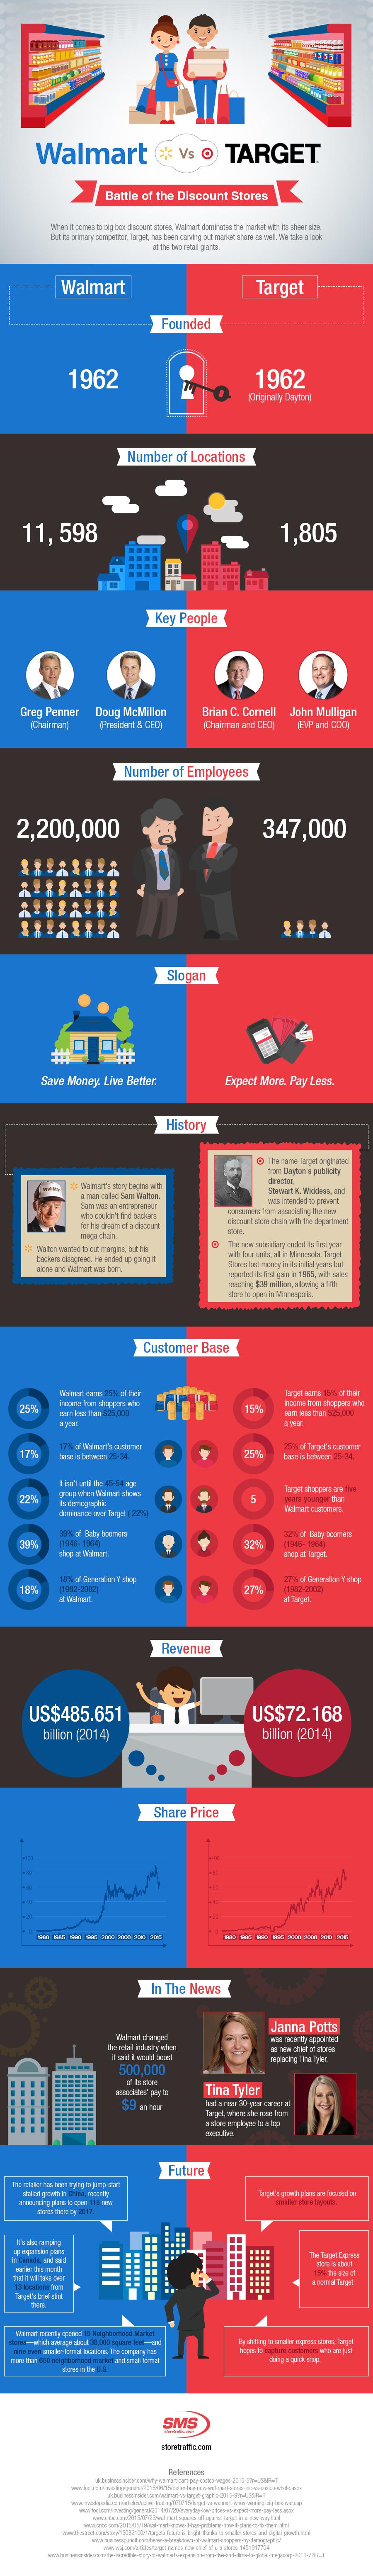 walmart-vs-target-an-infographic